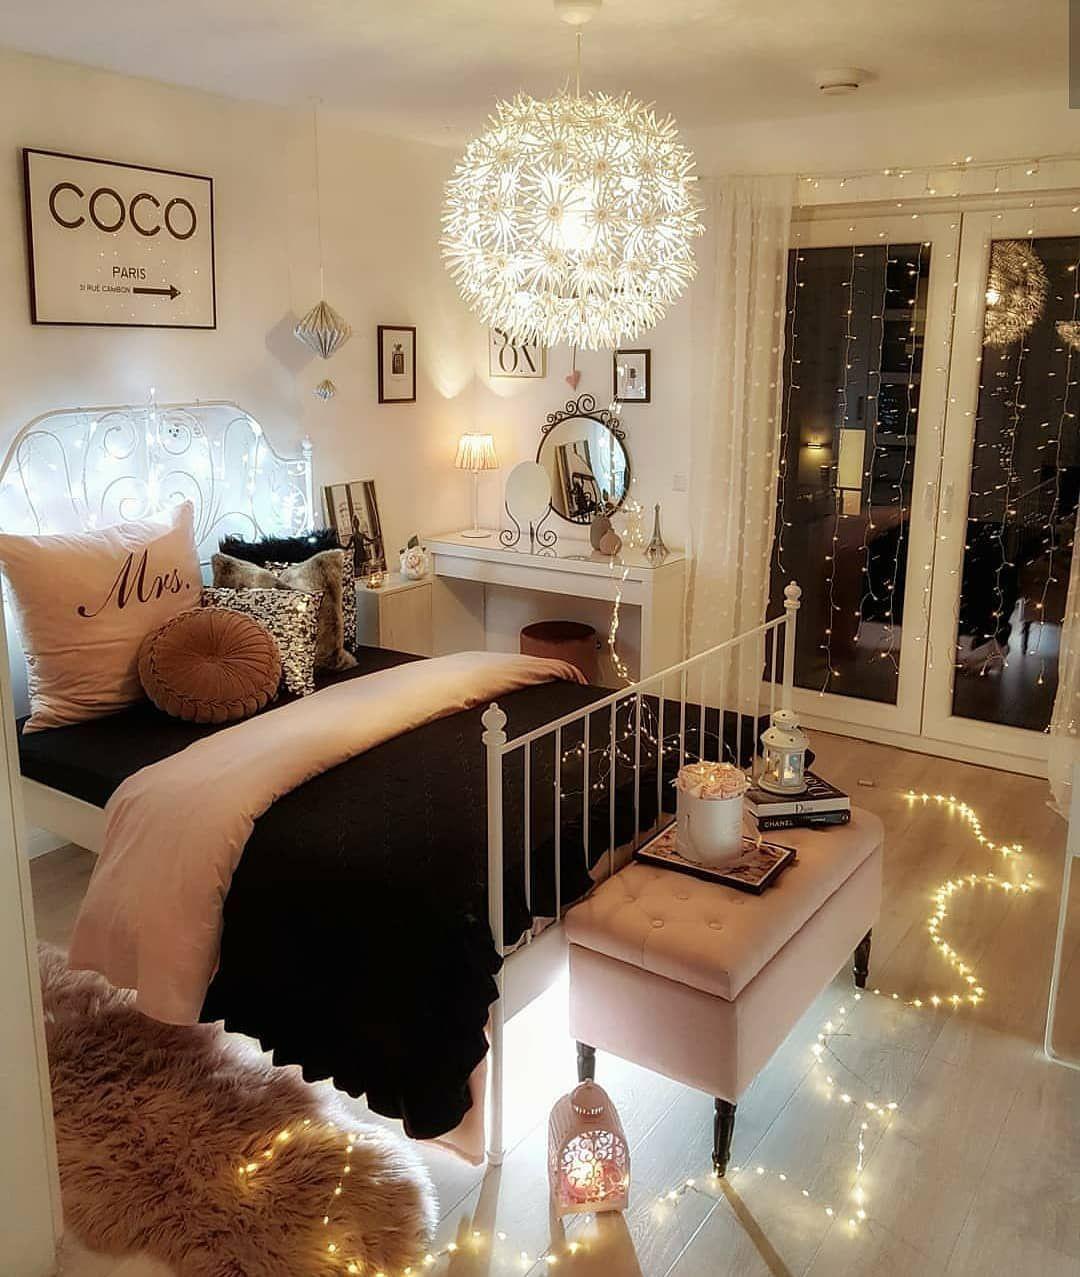 "Room Decor on Instagram: ""Yay or nay!? 💖💖✨✨ follow @roomdecor"